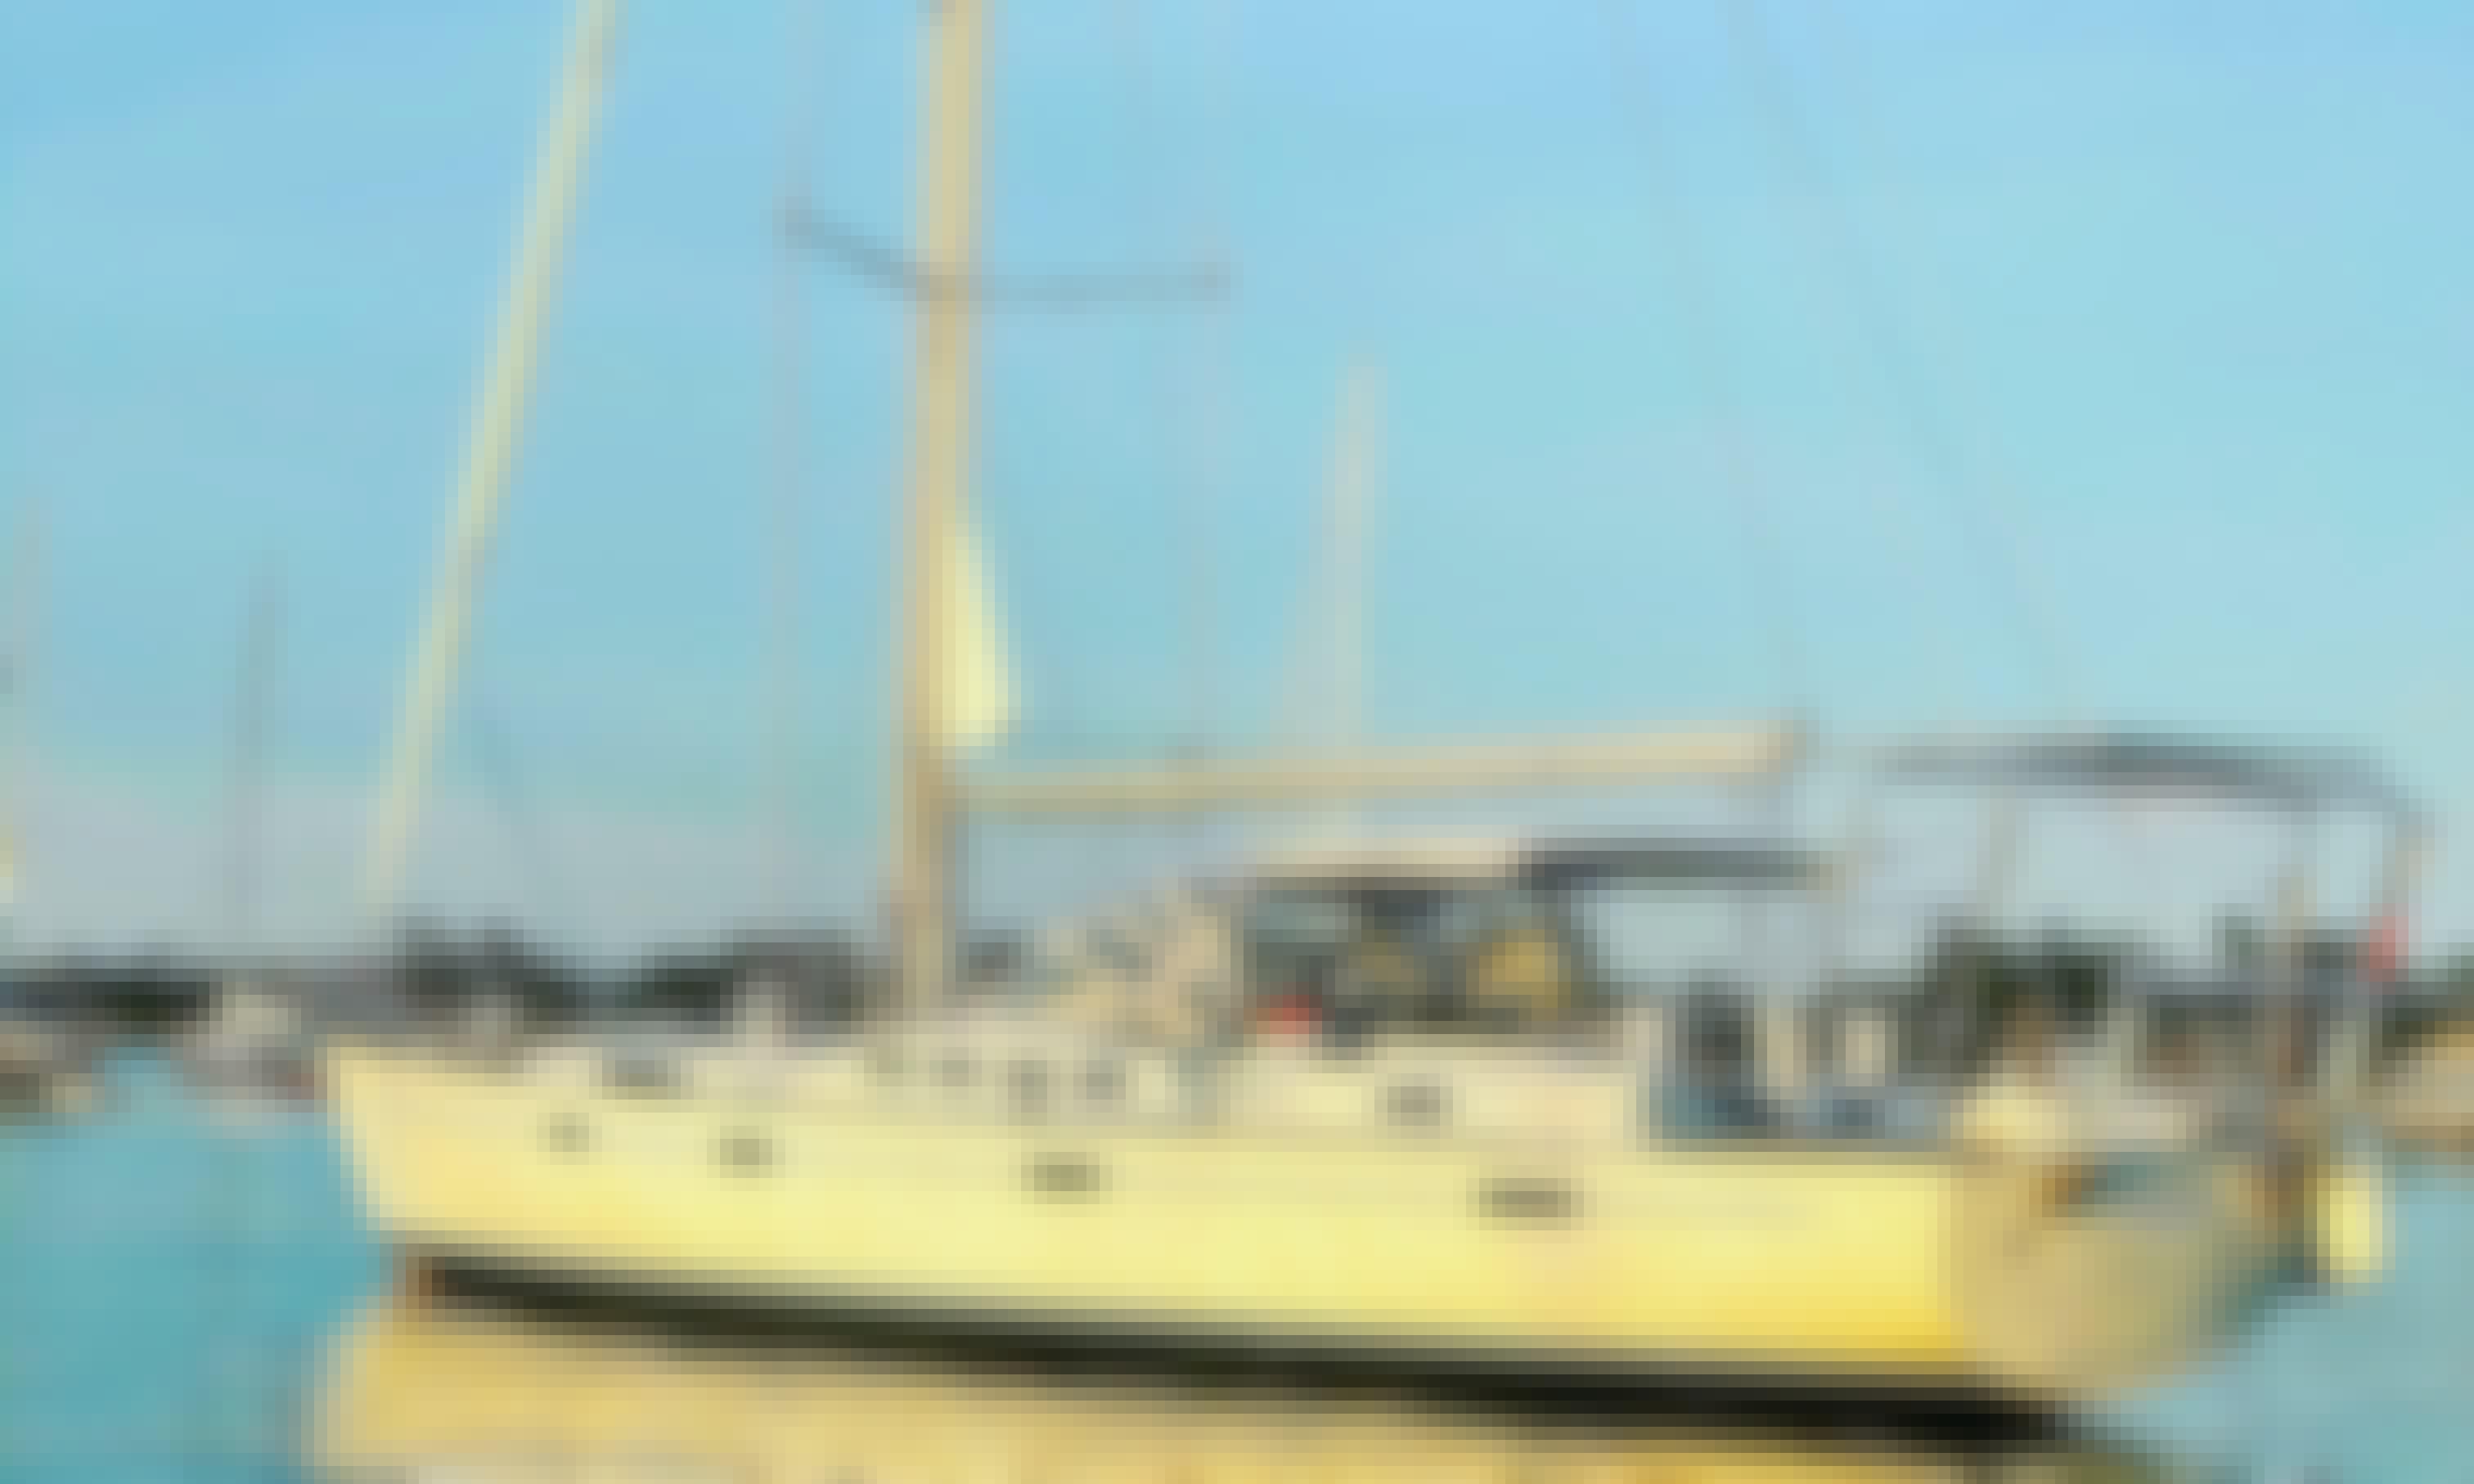 Beneteau 57' Luxury Sailing in Sag Harbor